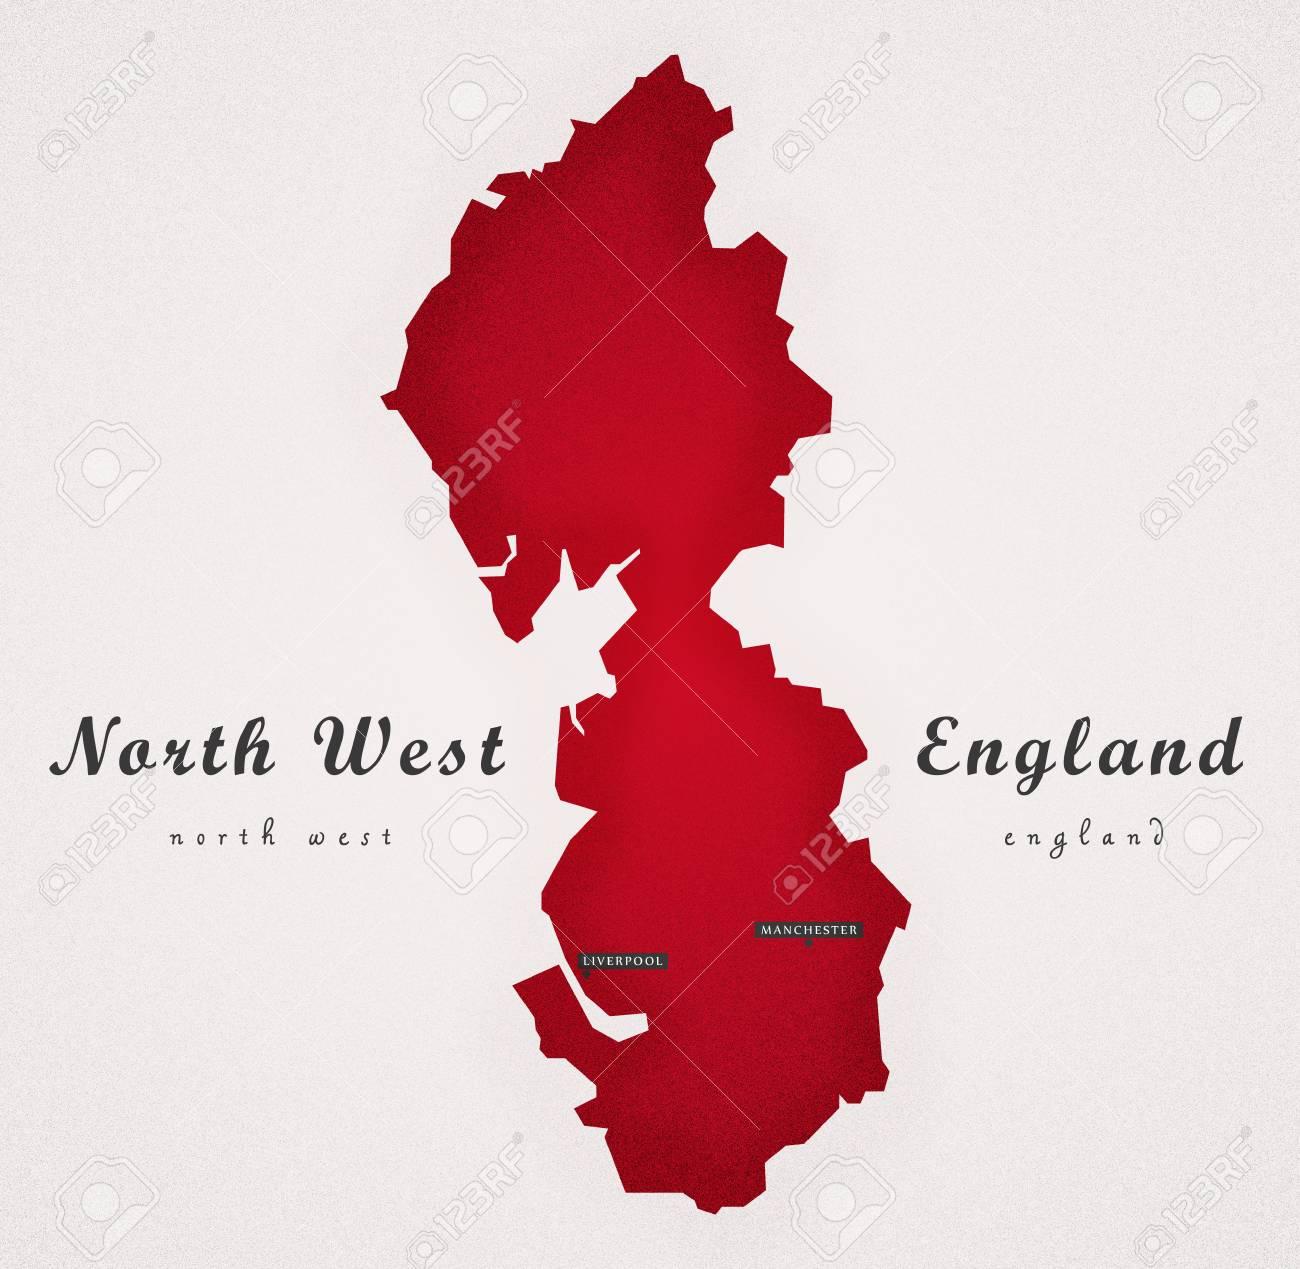 Map Of North Of England Uk.North West England Uk Art Map